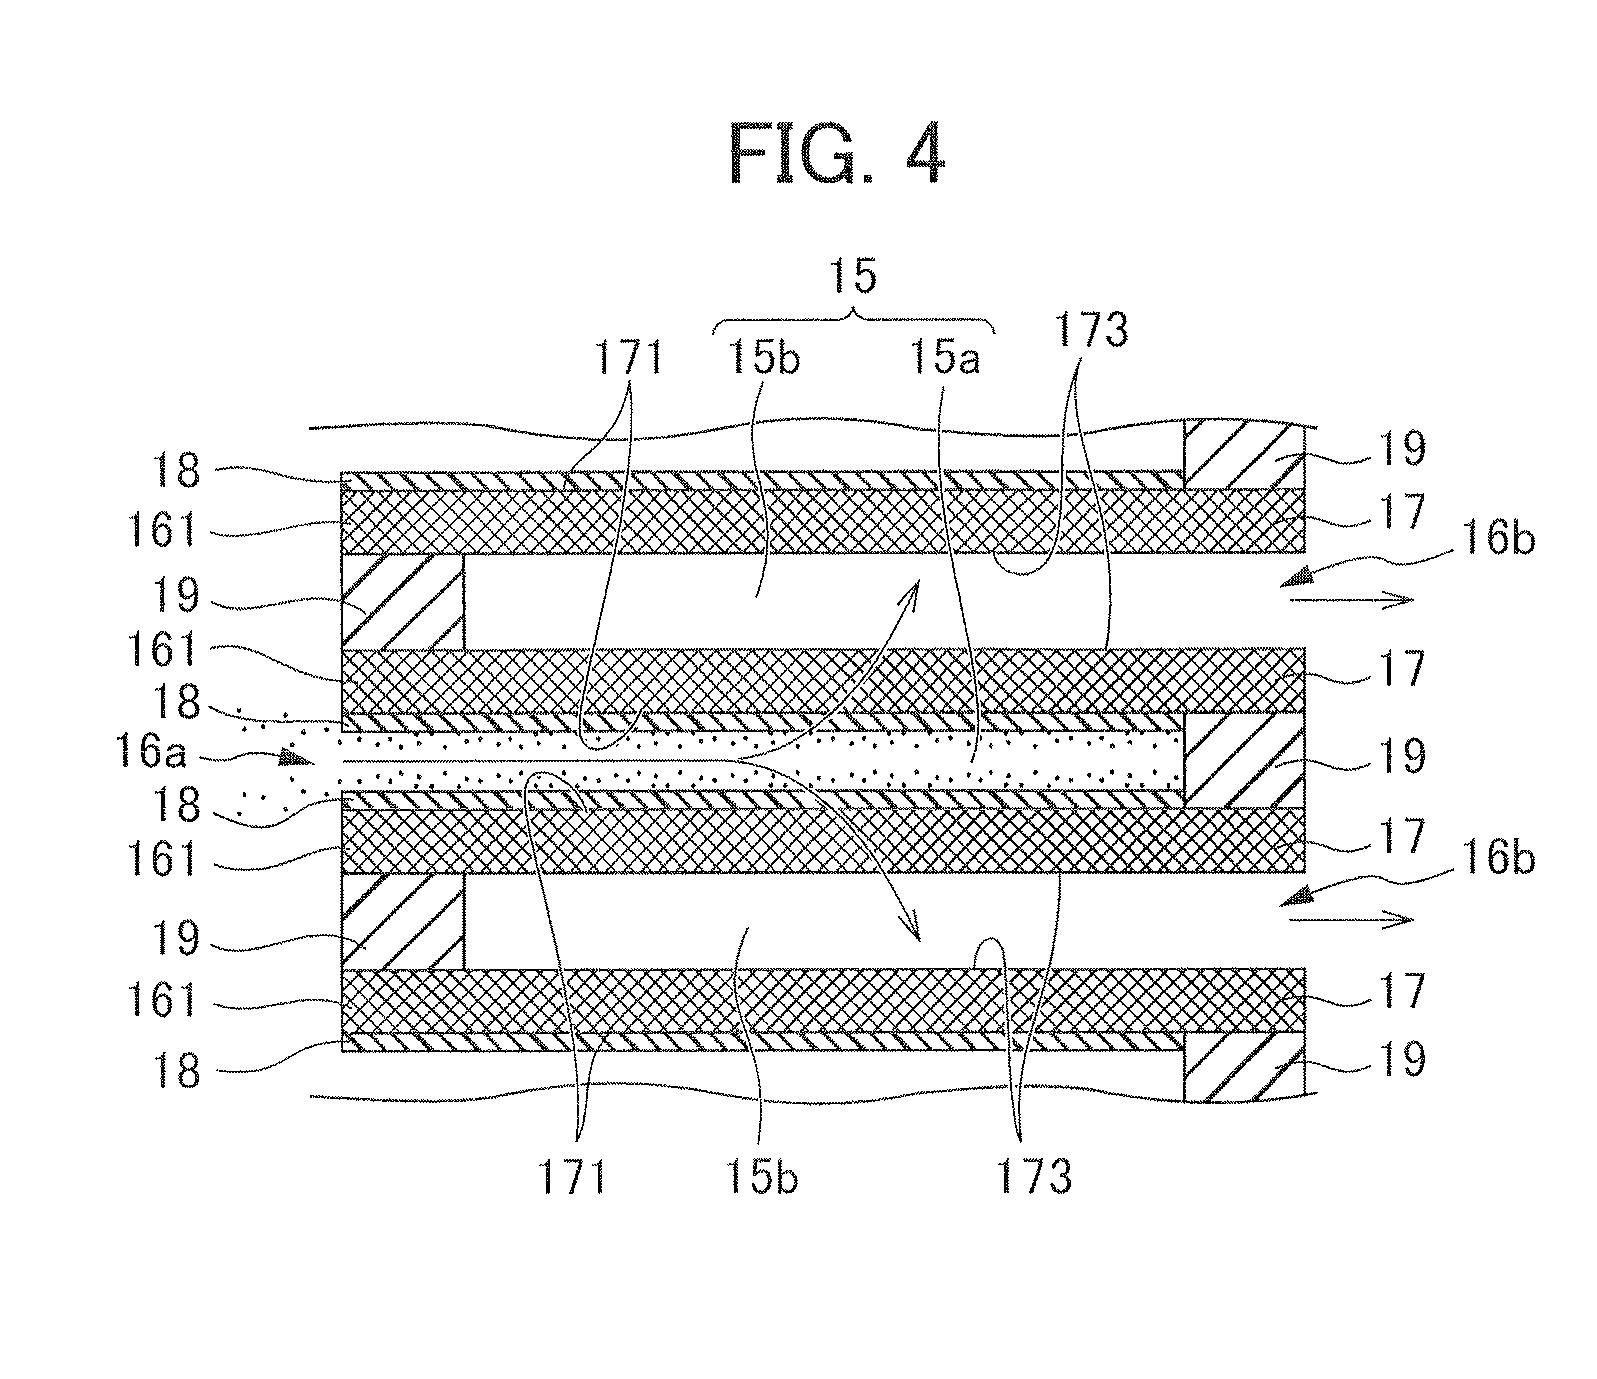 Patent US 8,449,643 B2